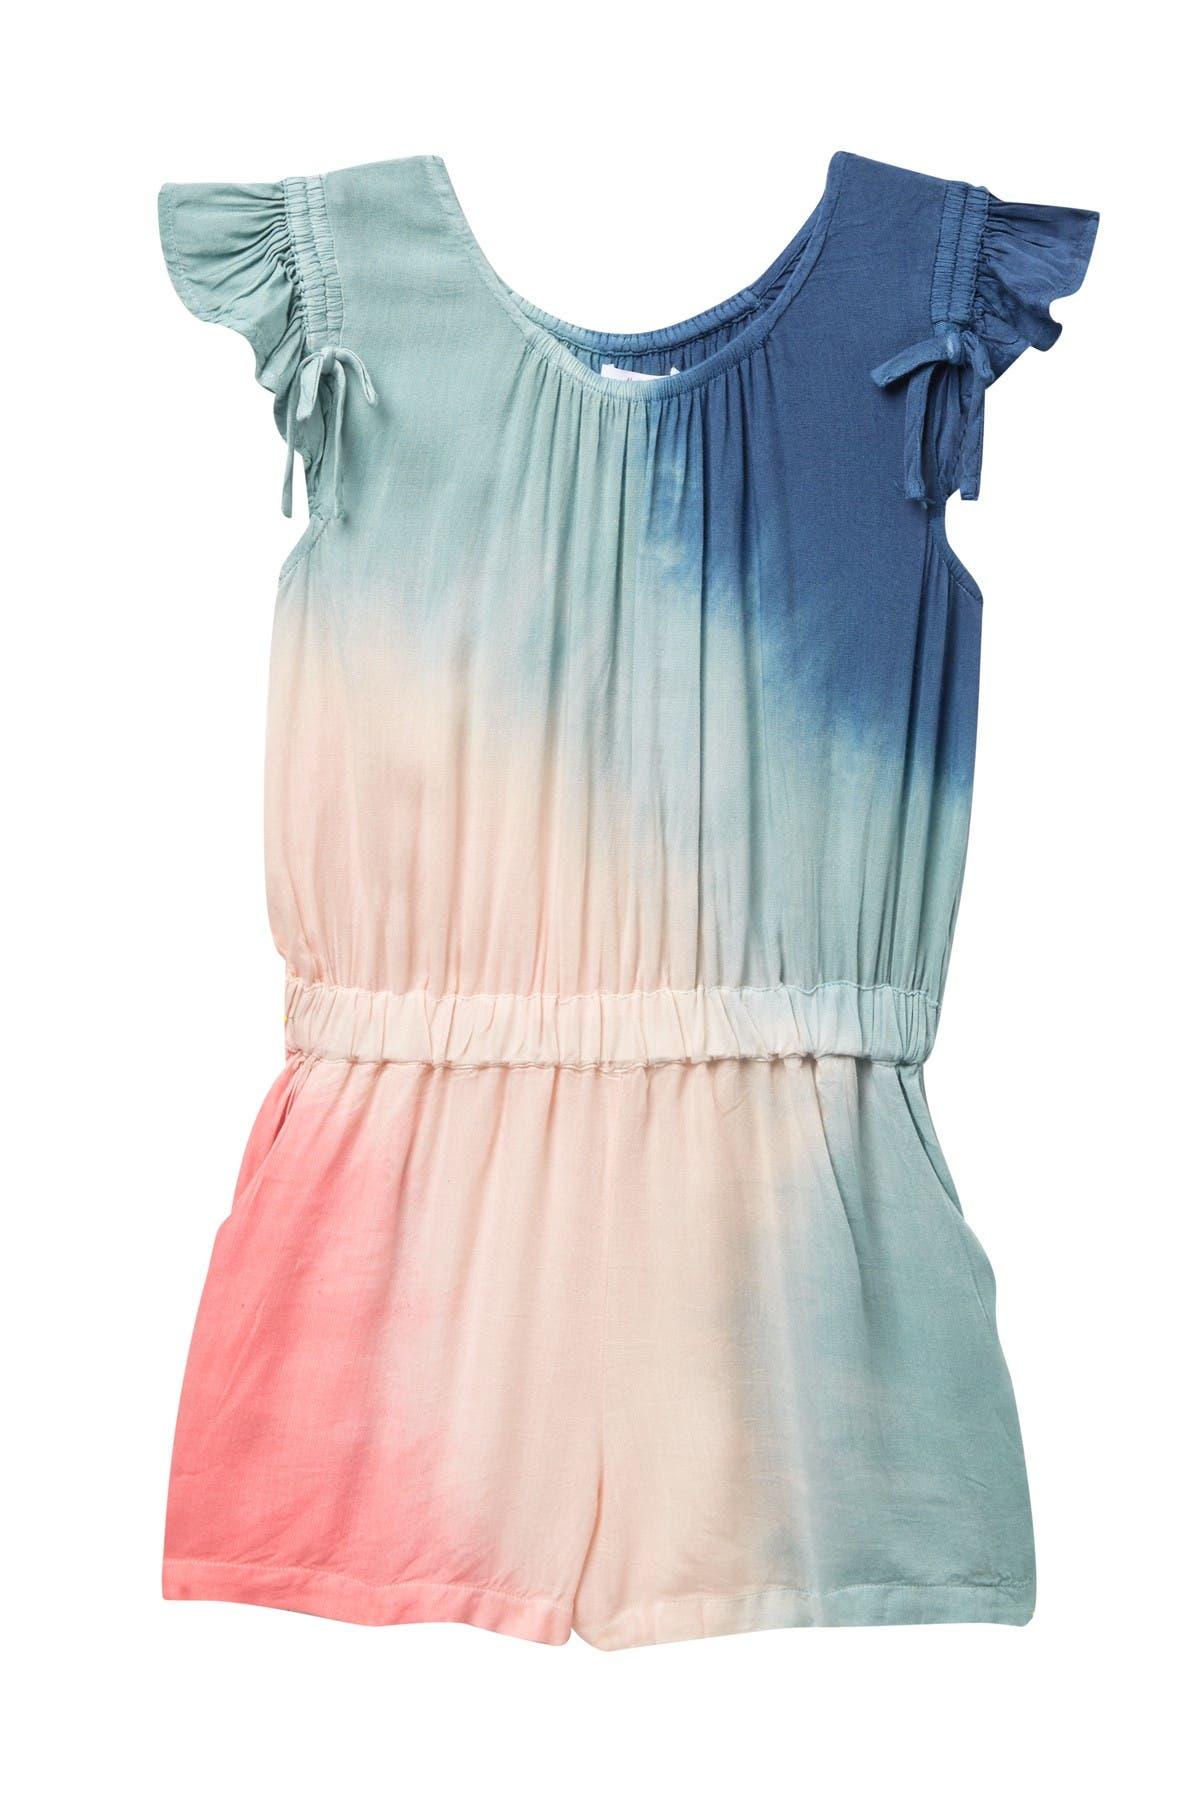 Image of Ella Moss Tie-Dye Voile Romper